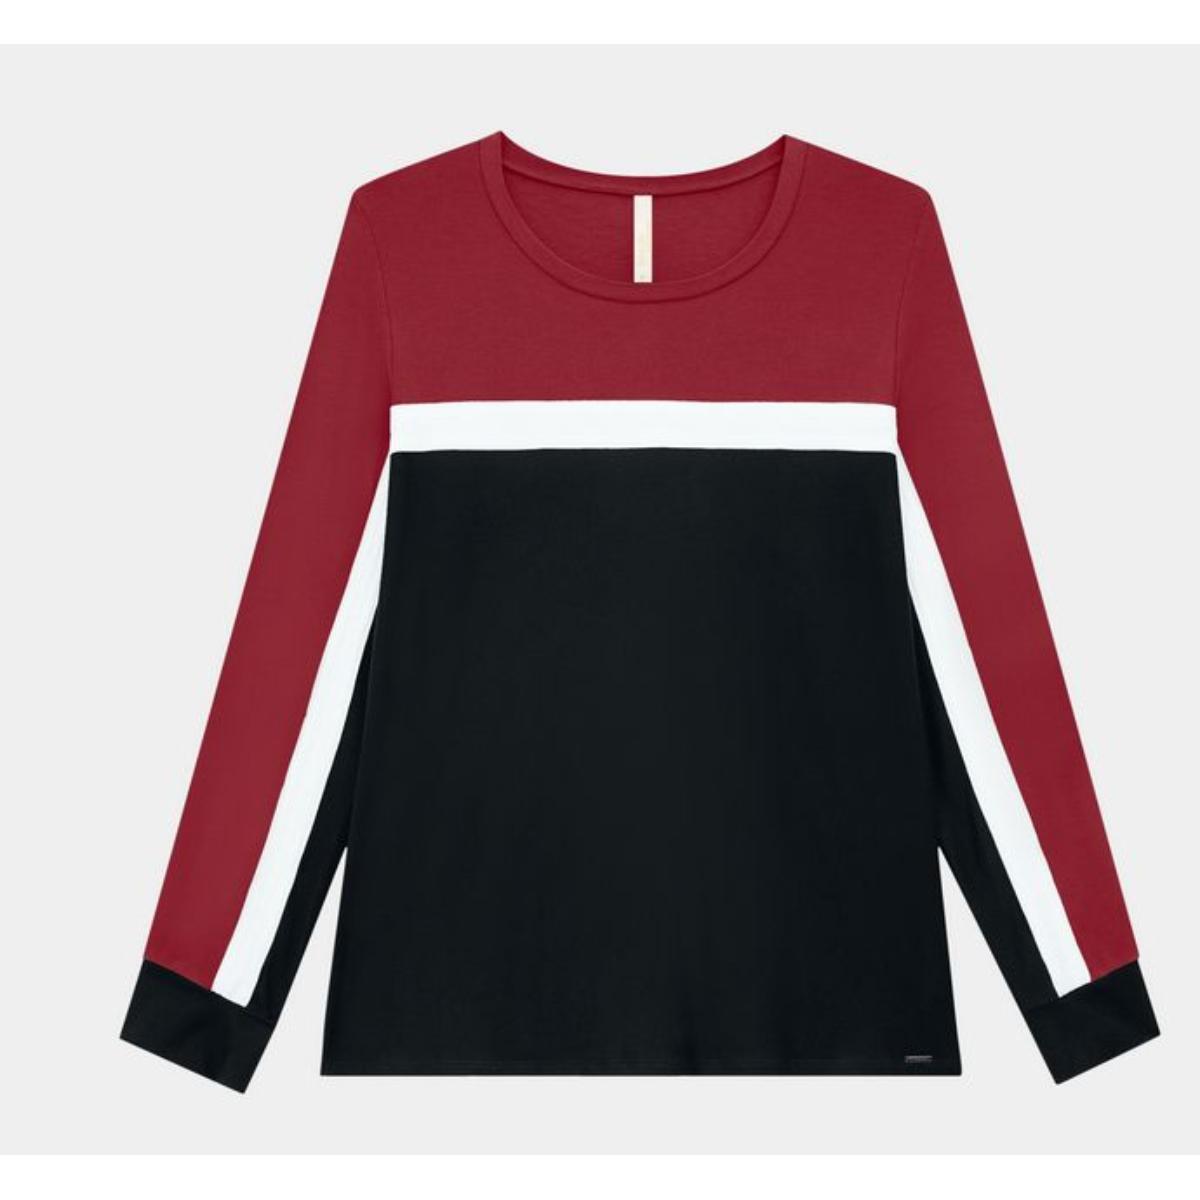 Blusa Feminina Lunender 60174 Vermelho/preto